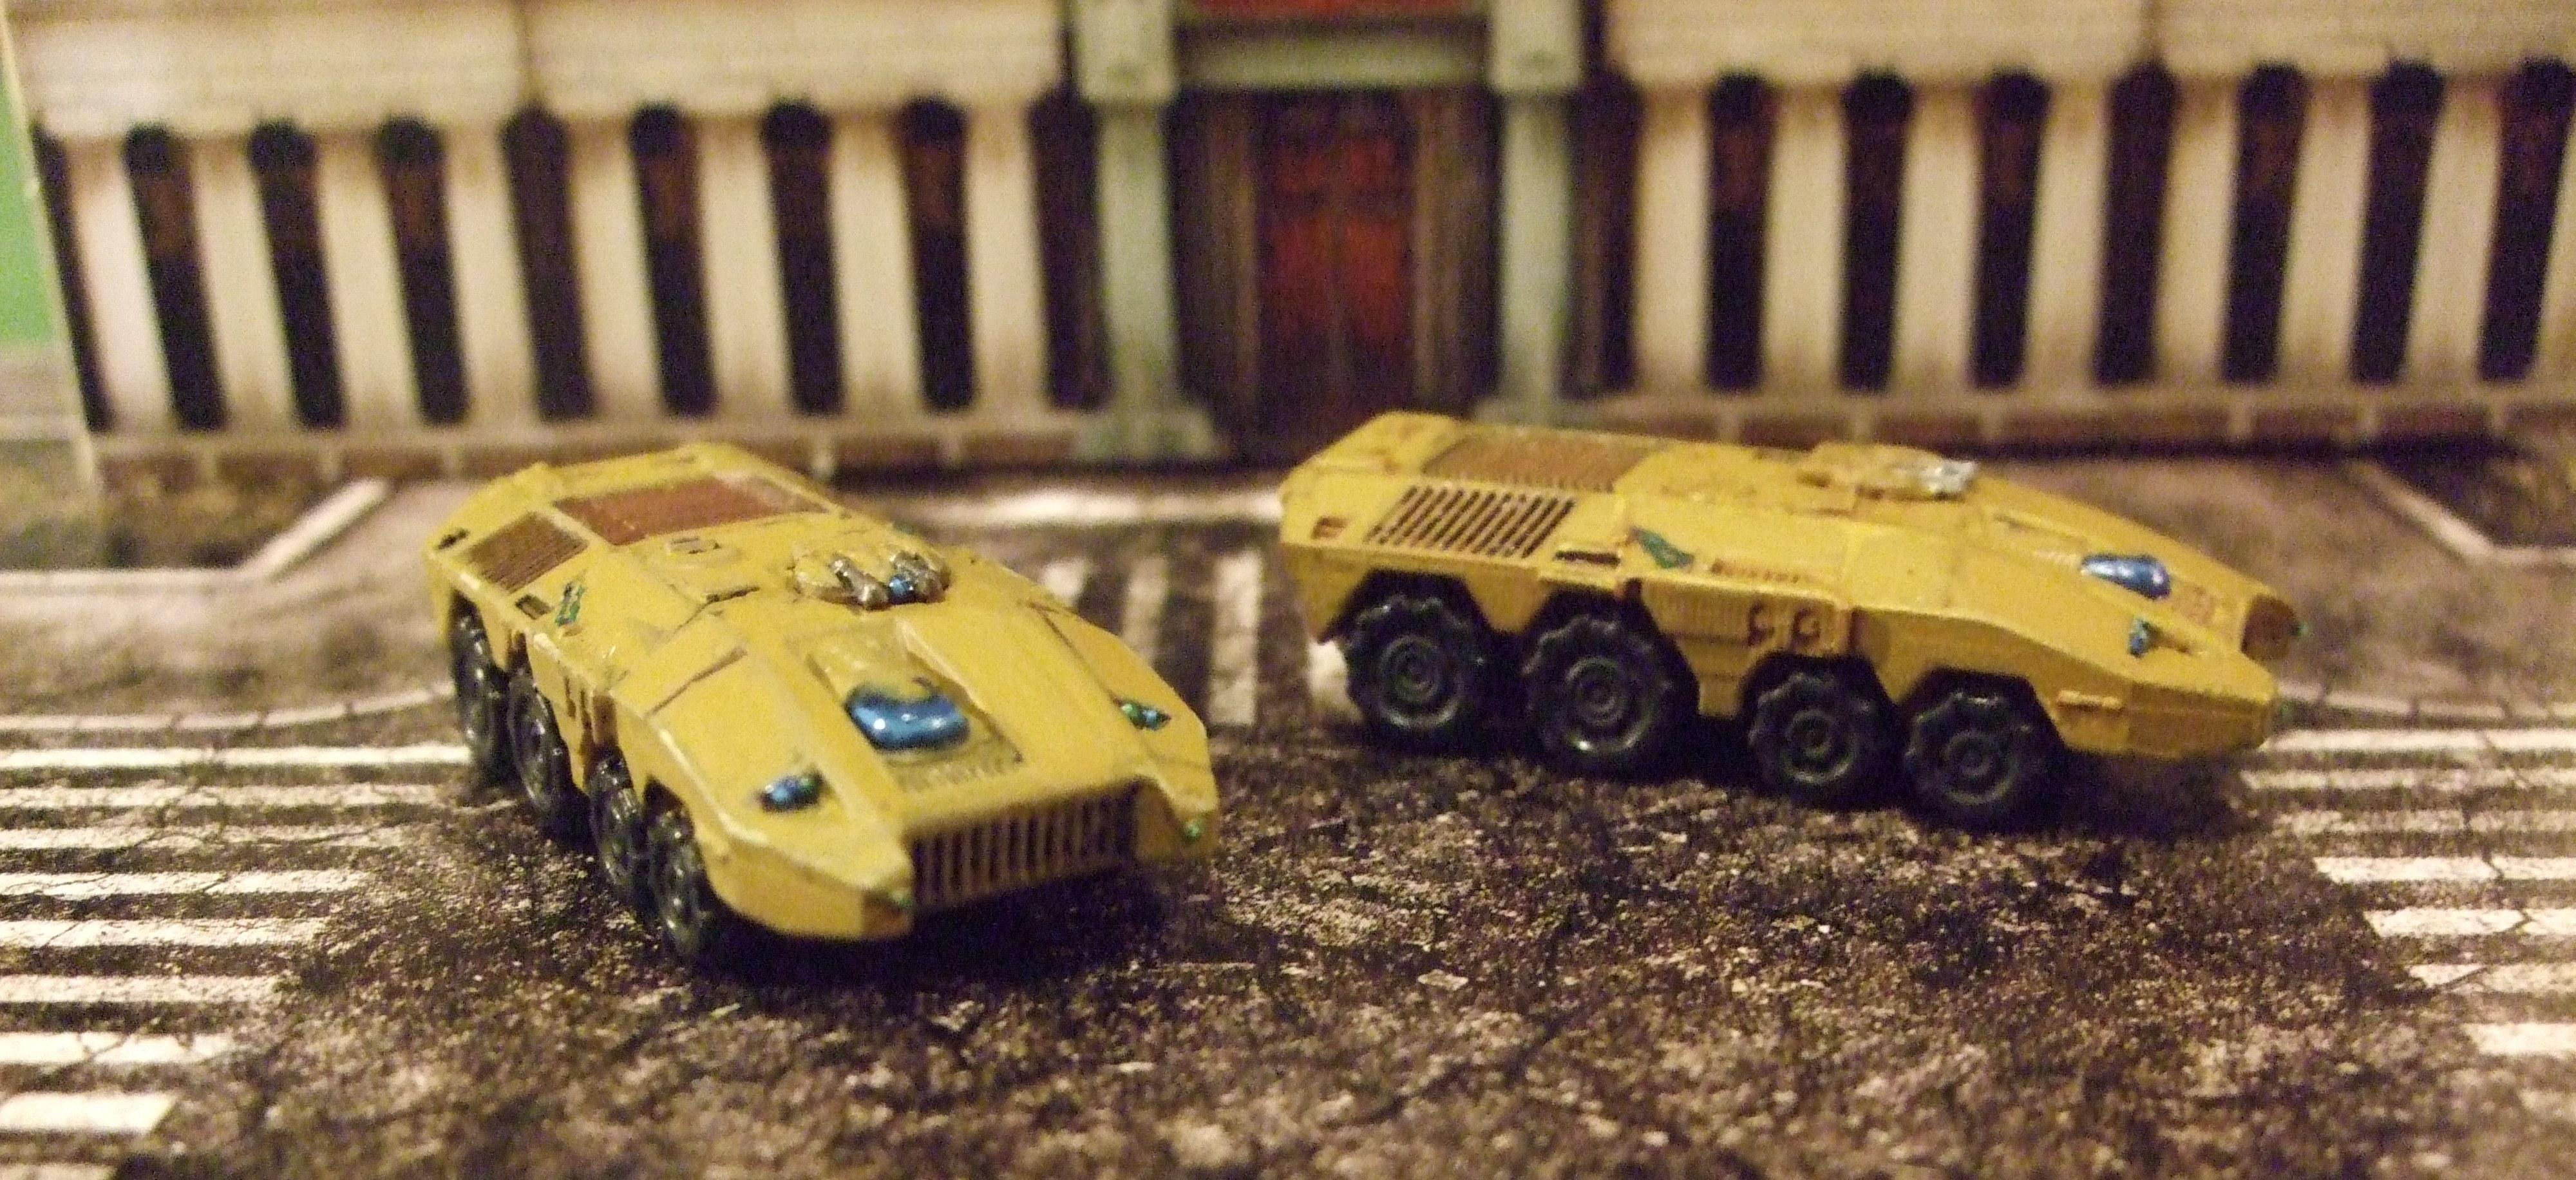 10mm, Desert, Dropzone Commander, Dzc, Gdi, Ucm